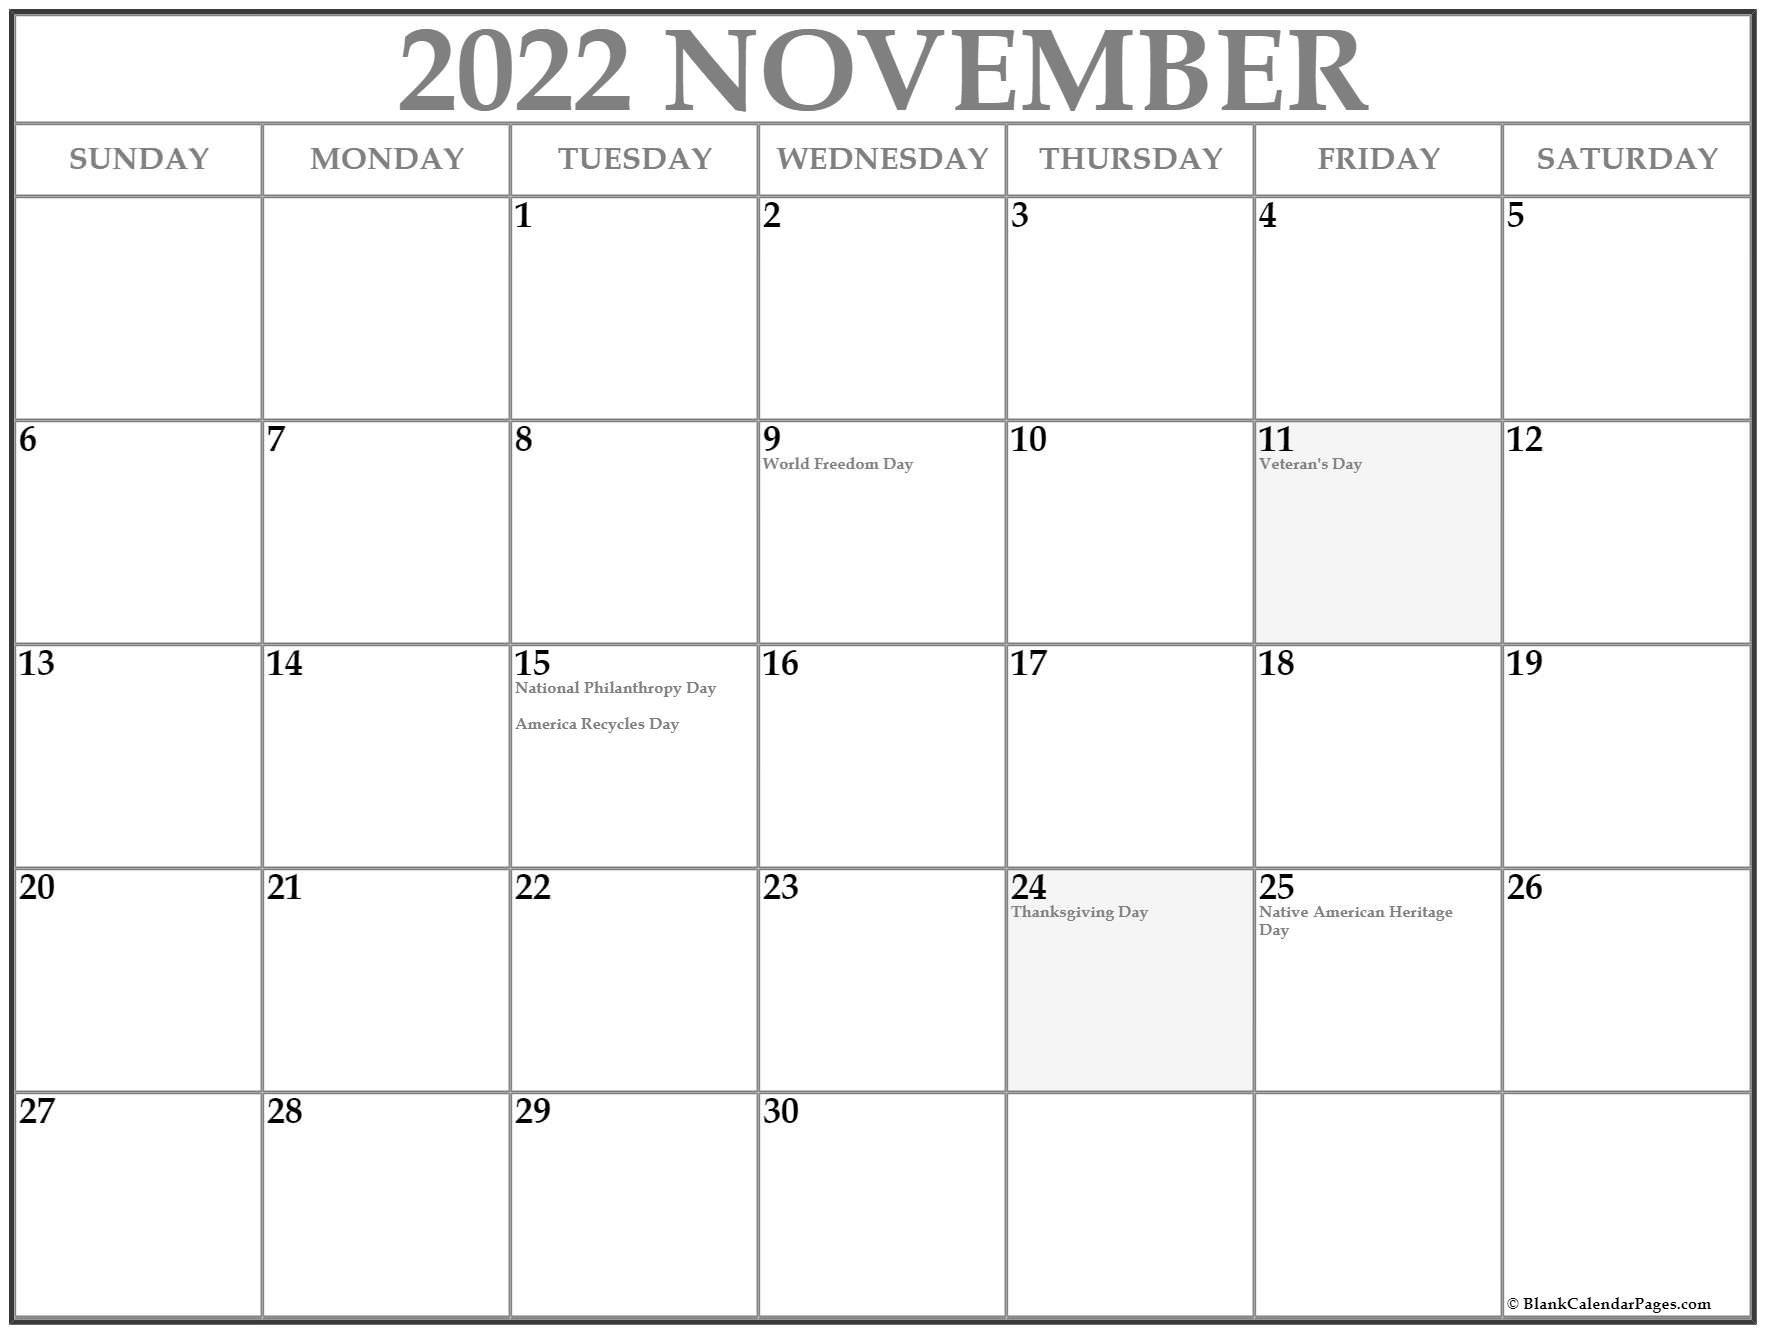 November 2022 Calendar With Holidays throughout November 2022 Calendar Planner Printable Photo